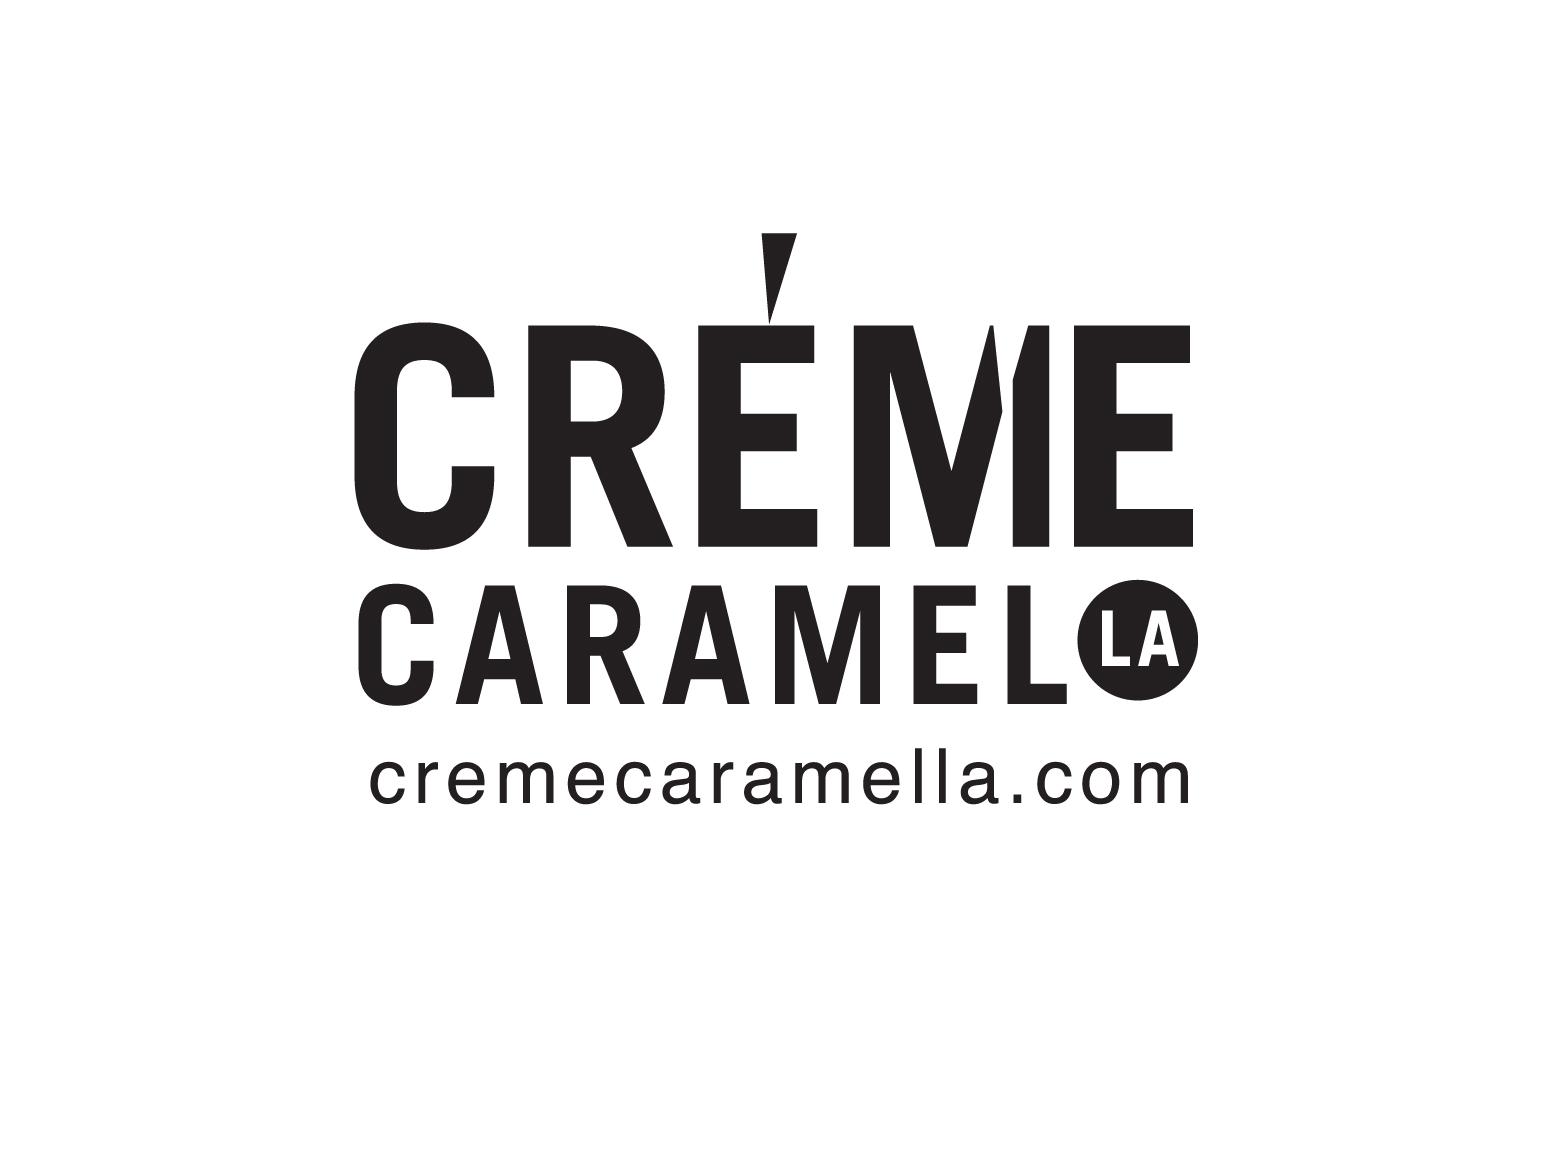 Creme Caramel LA logo (1).jpg